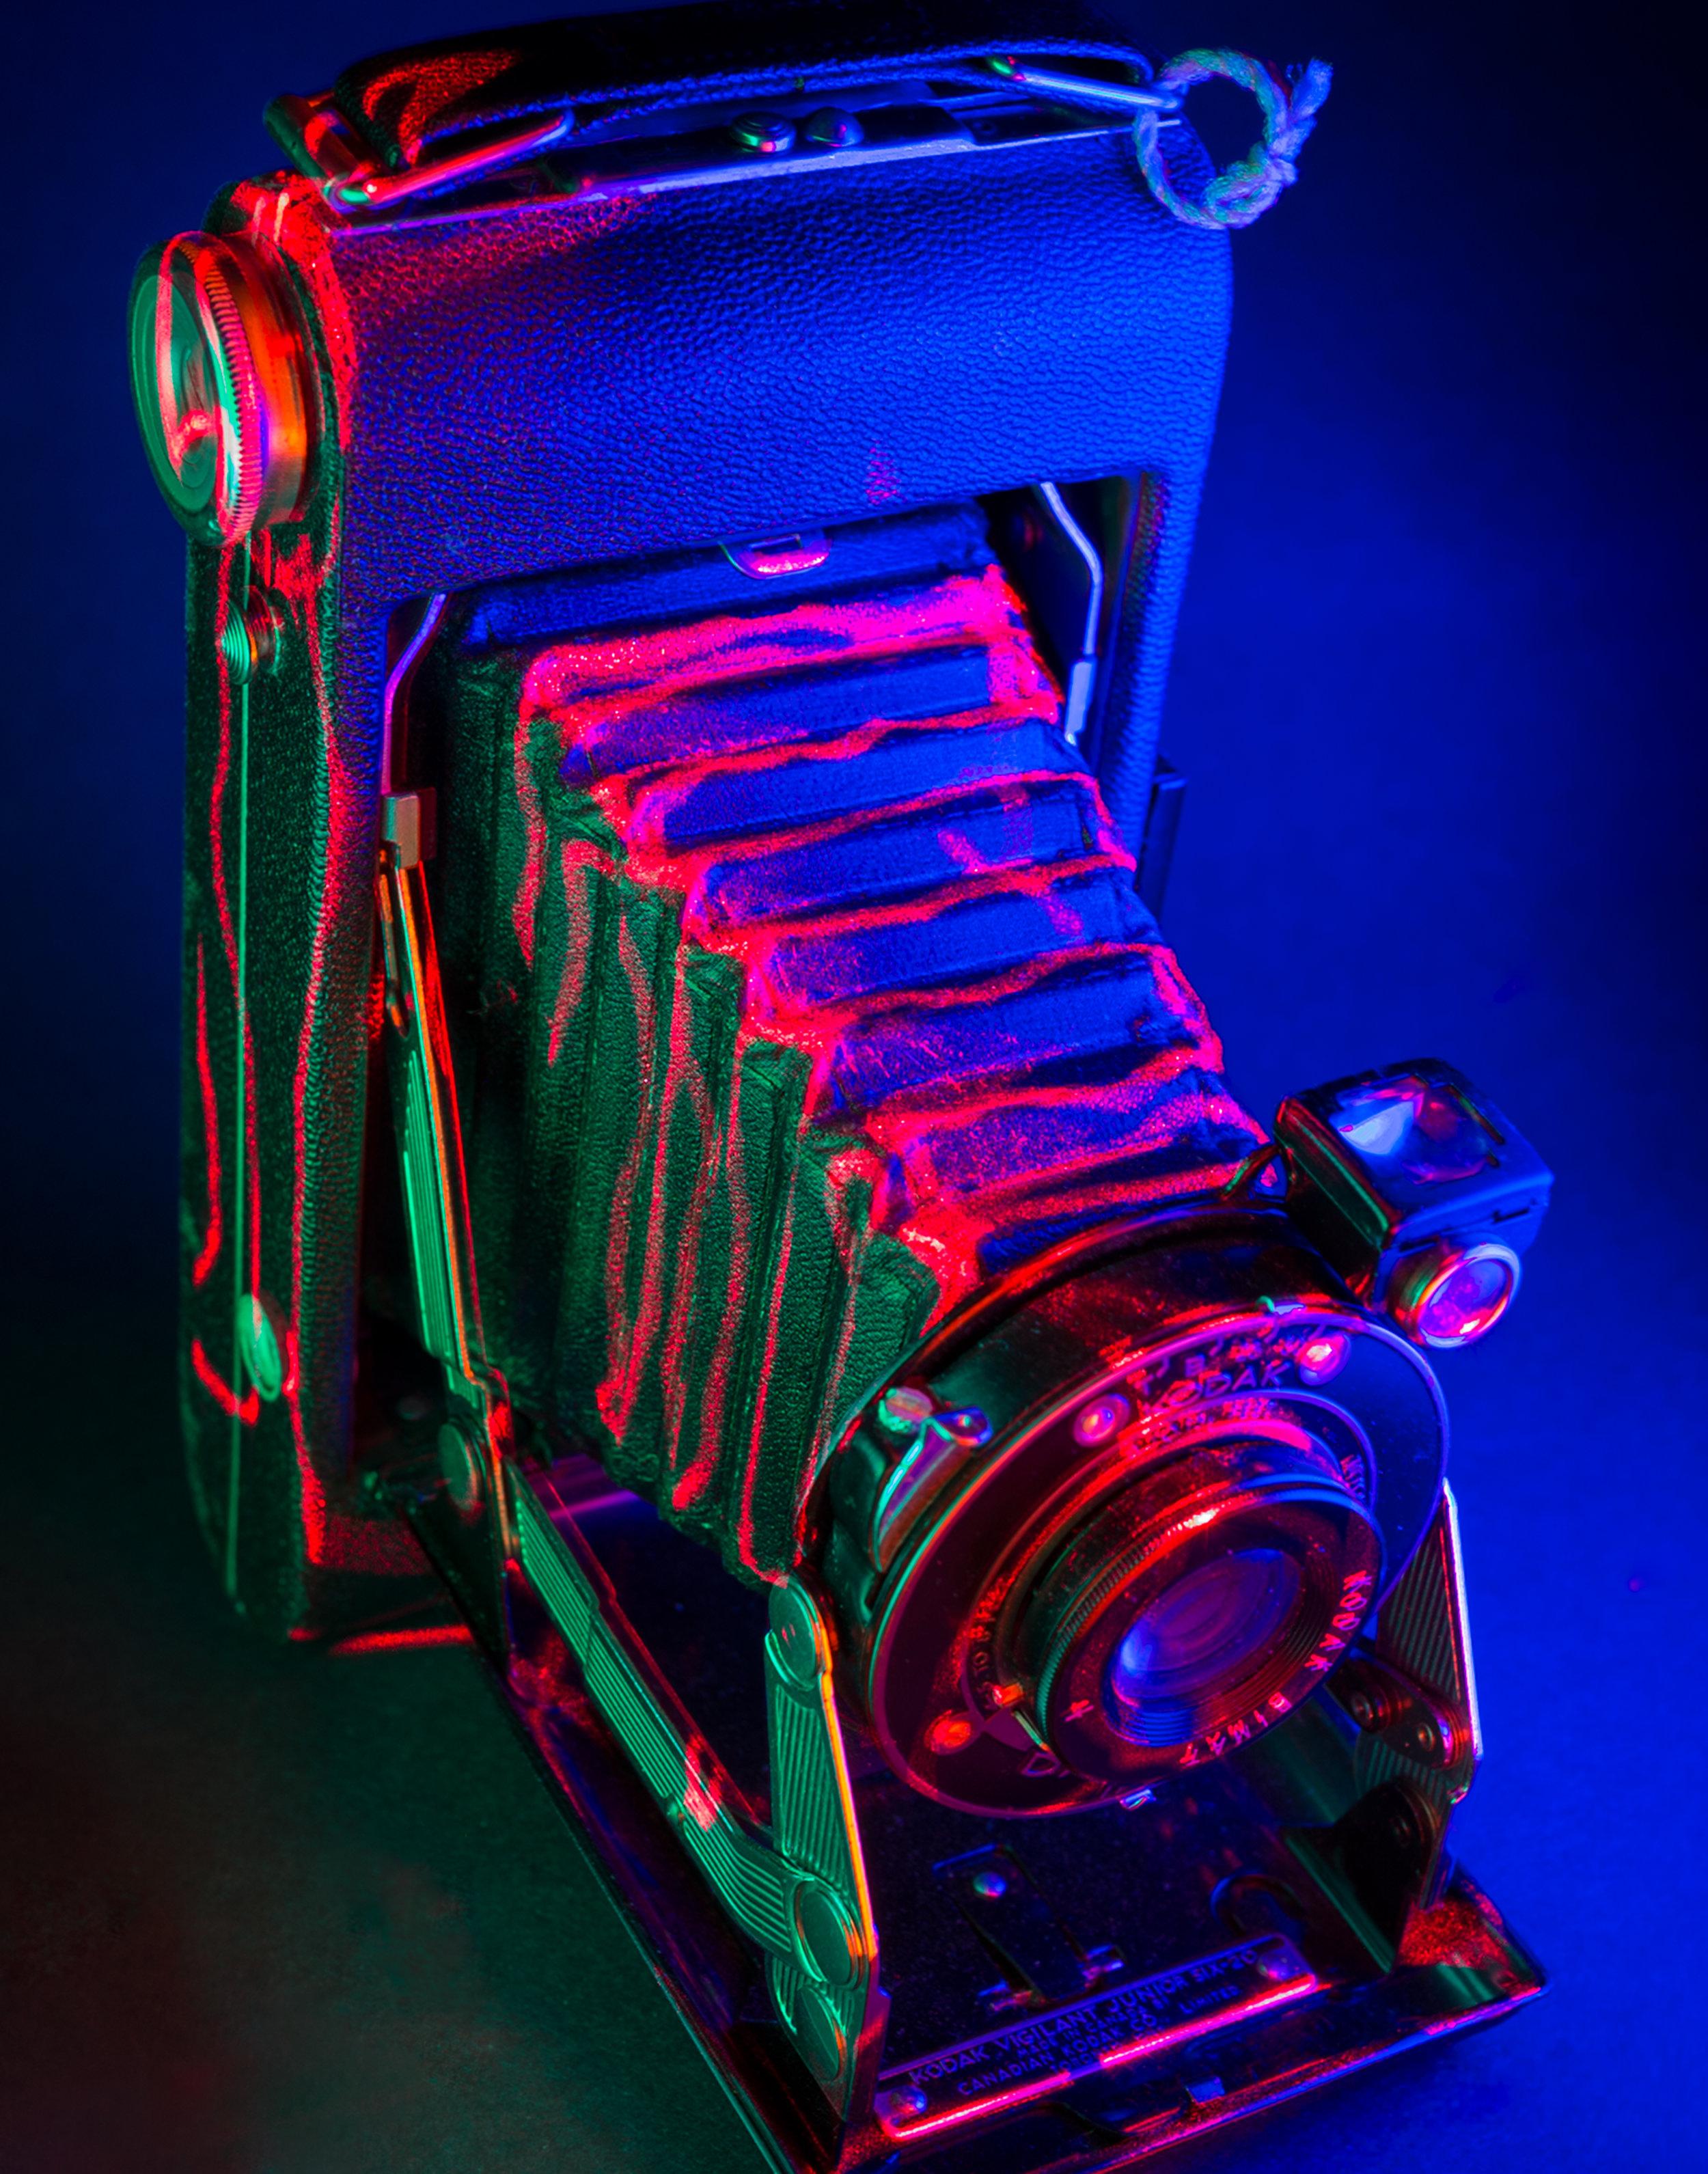 LightPainted_Camera.jpg